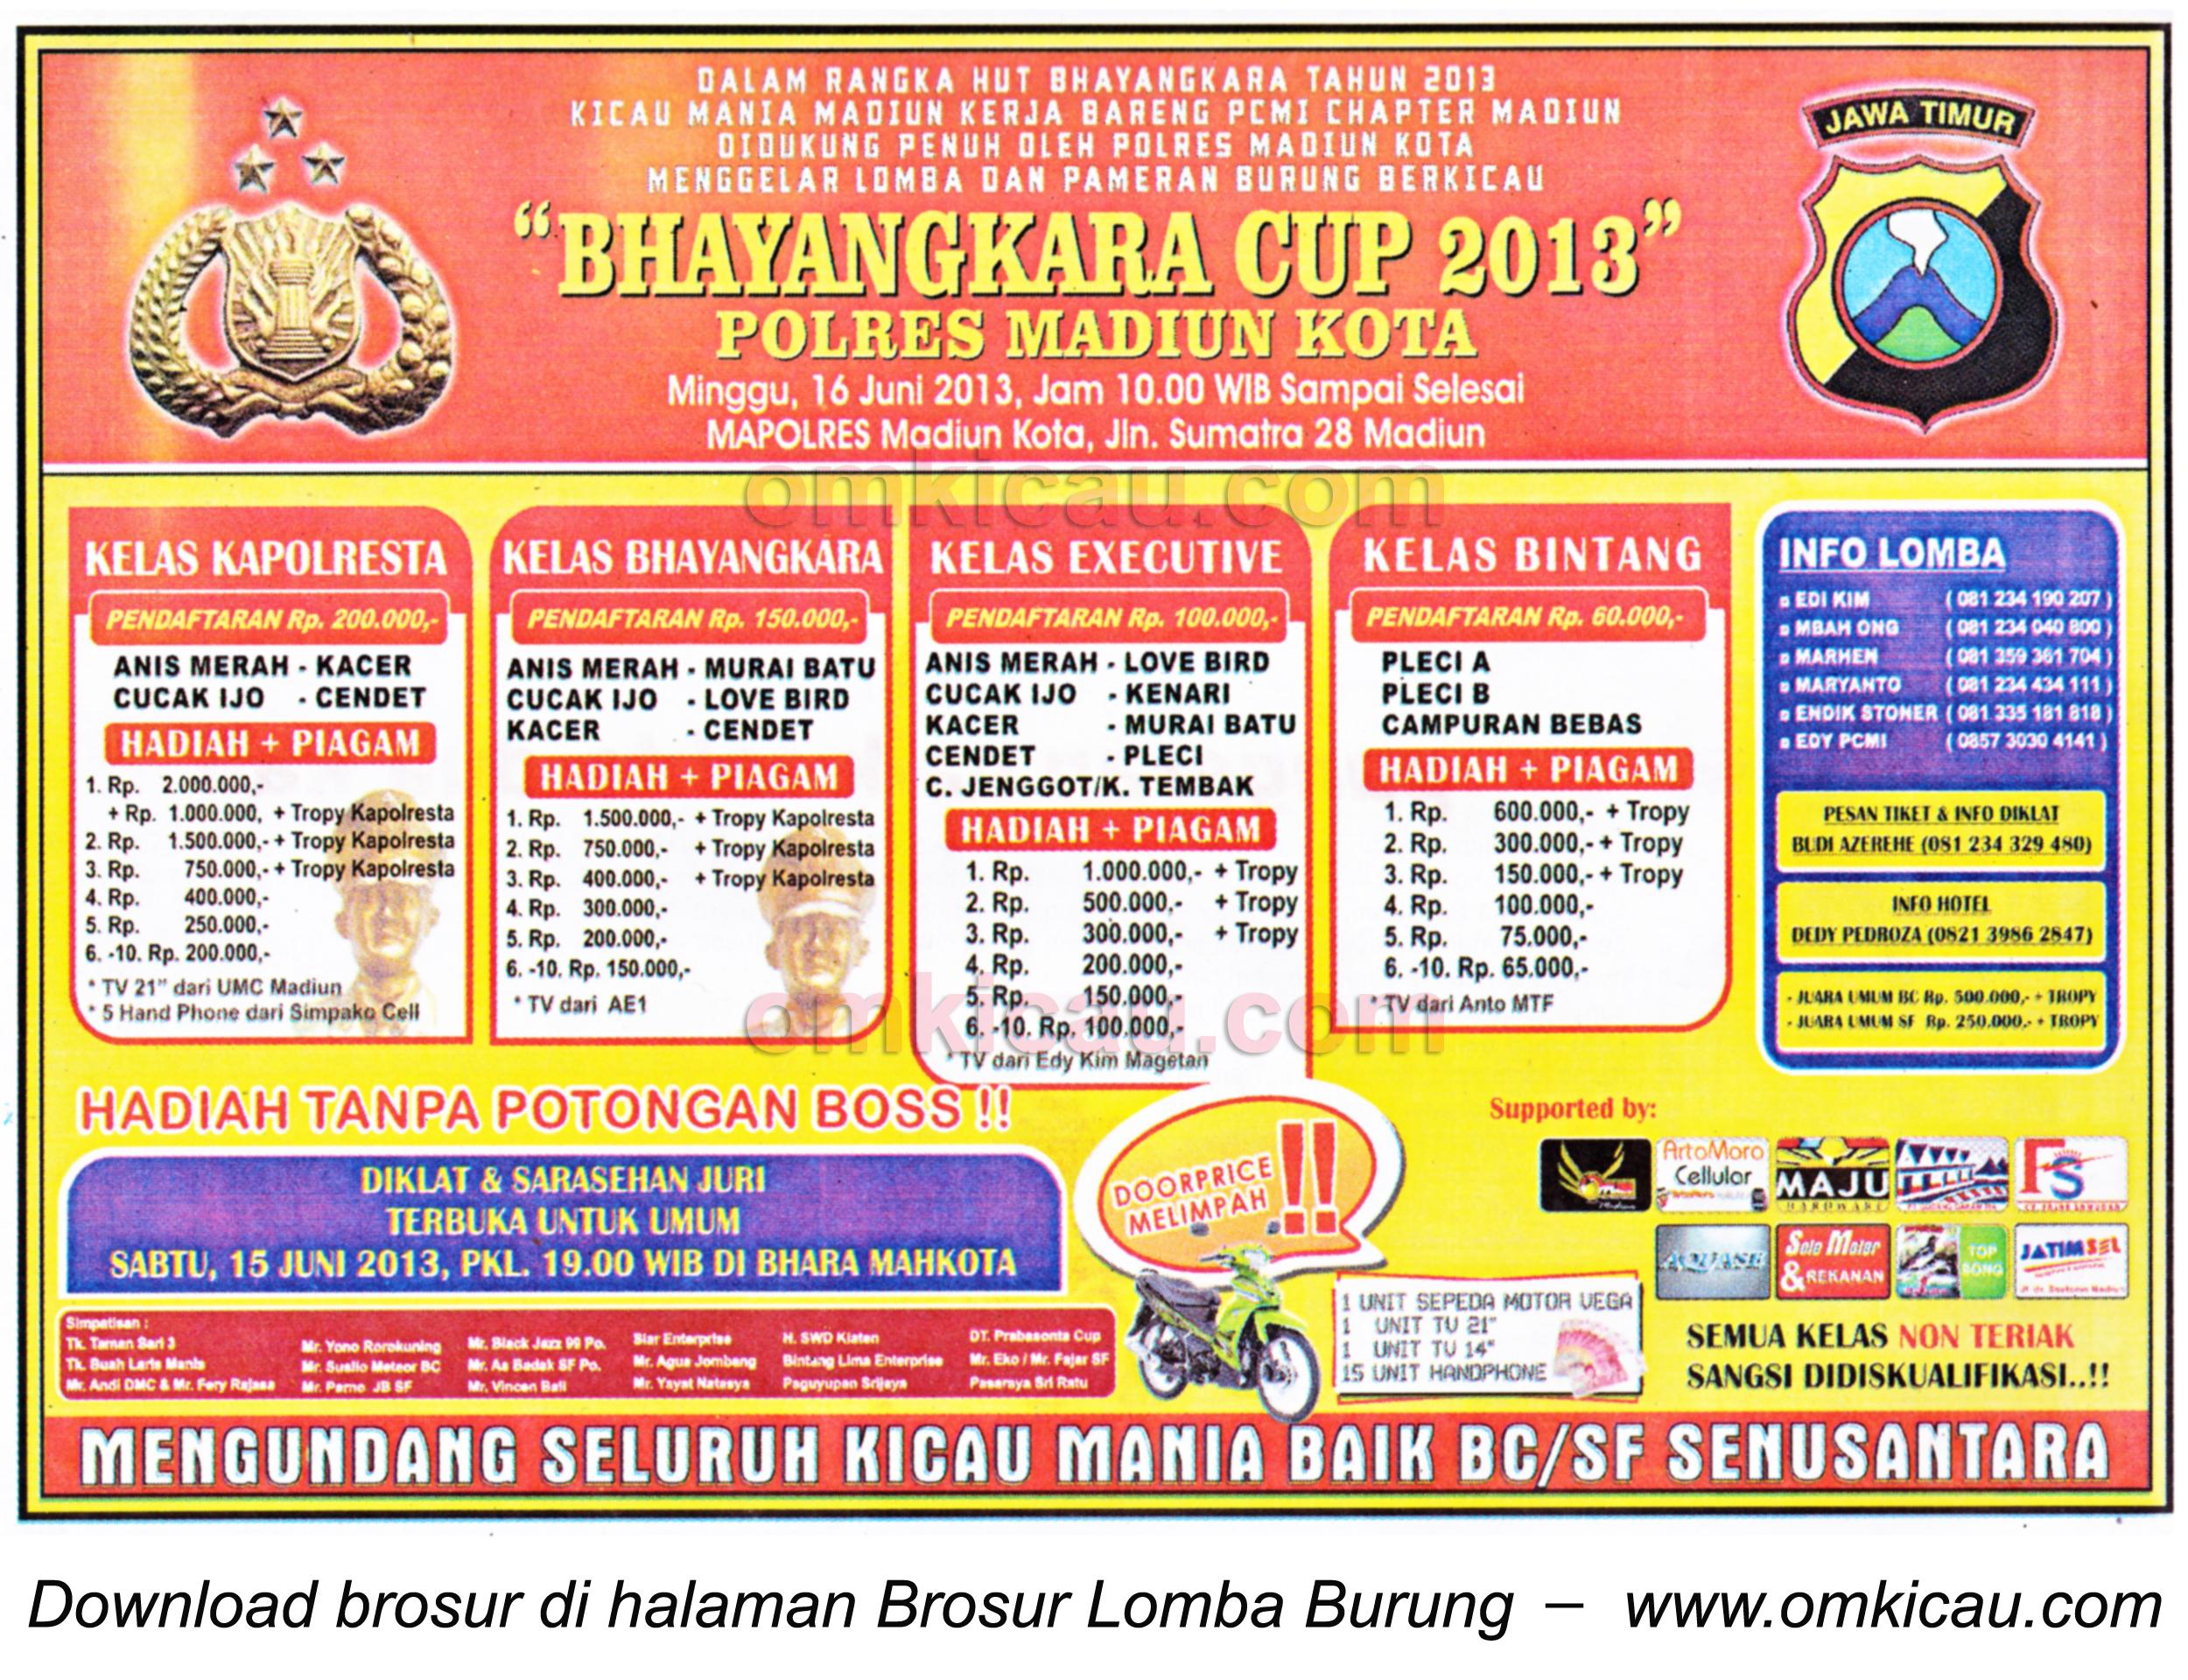 Brosur Lomba Burung Bhayangkara Cup Madiun 16 Juni 2013